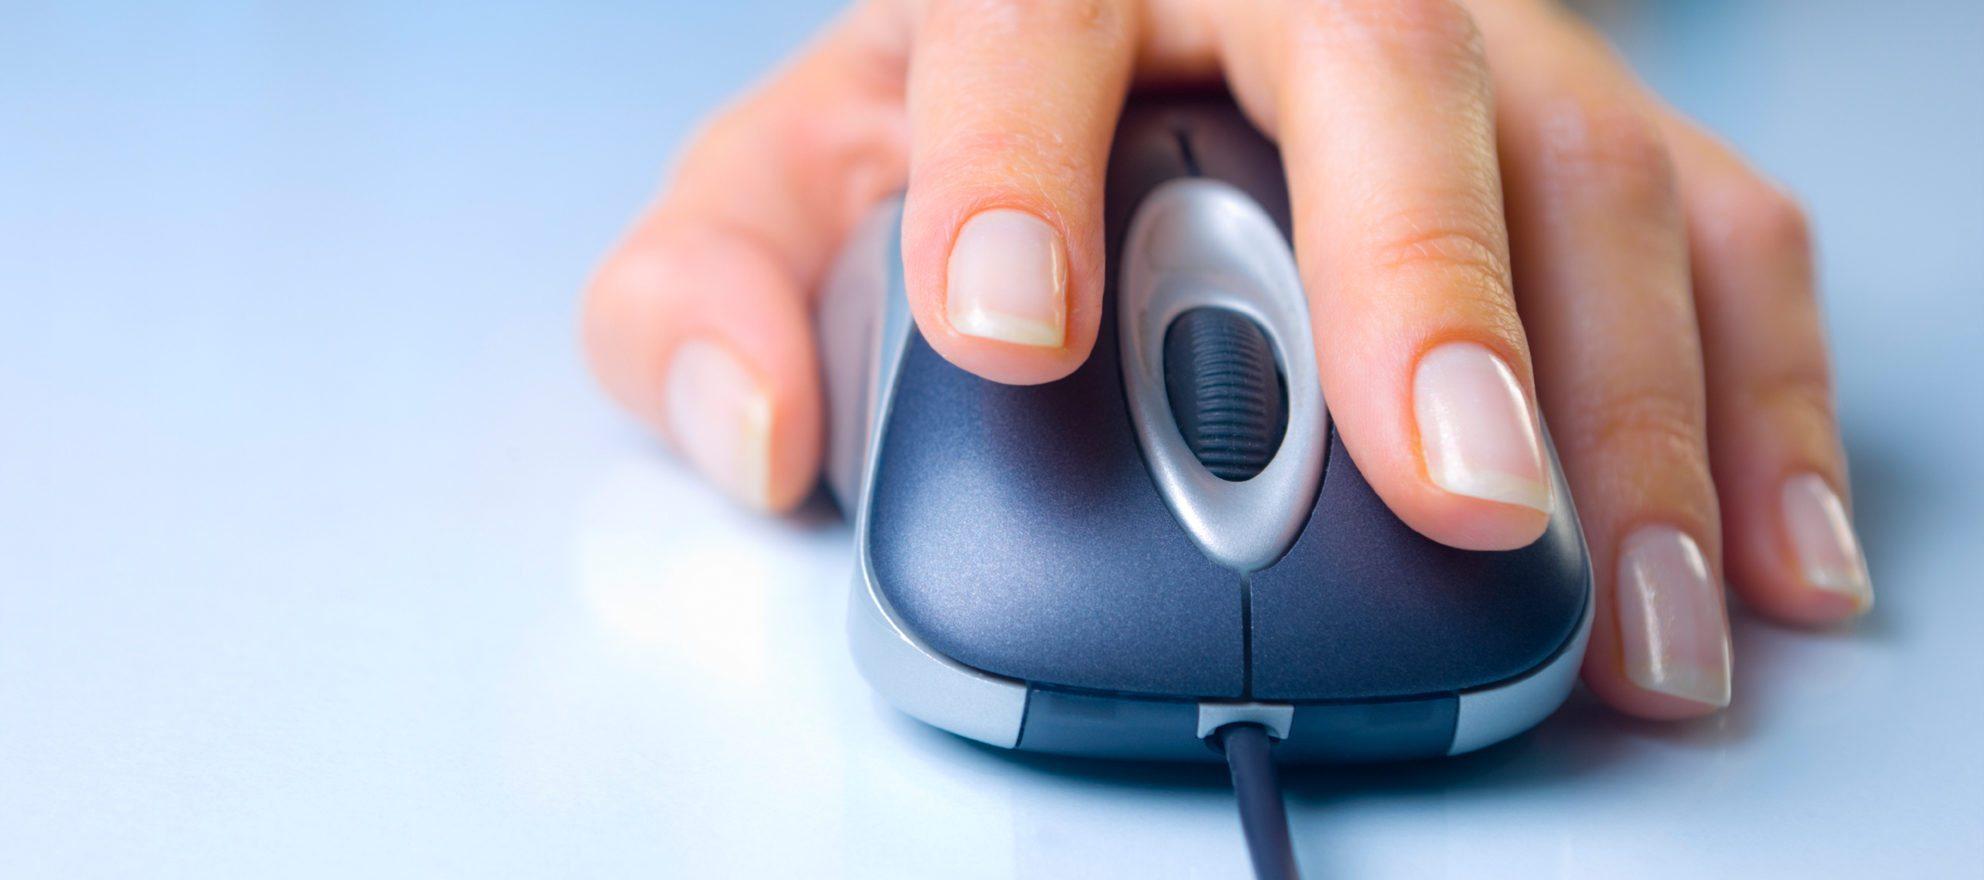 How to reinvigorate your underused website